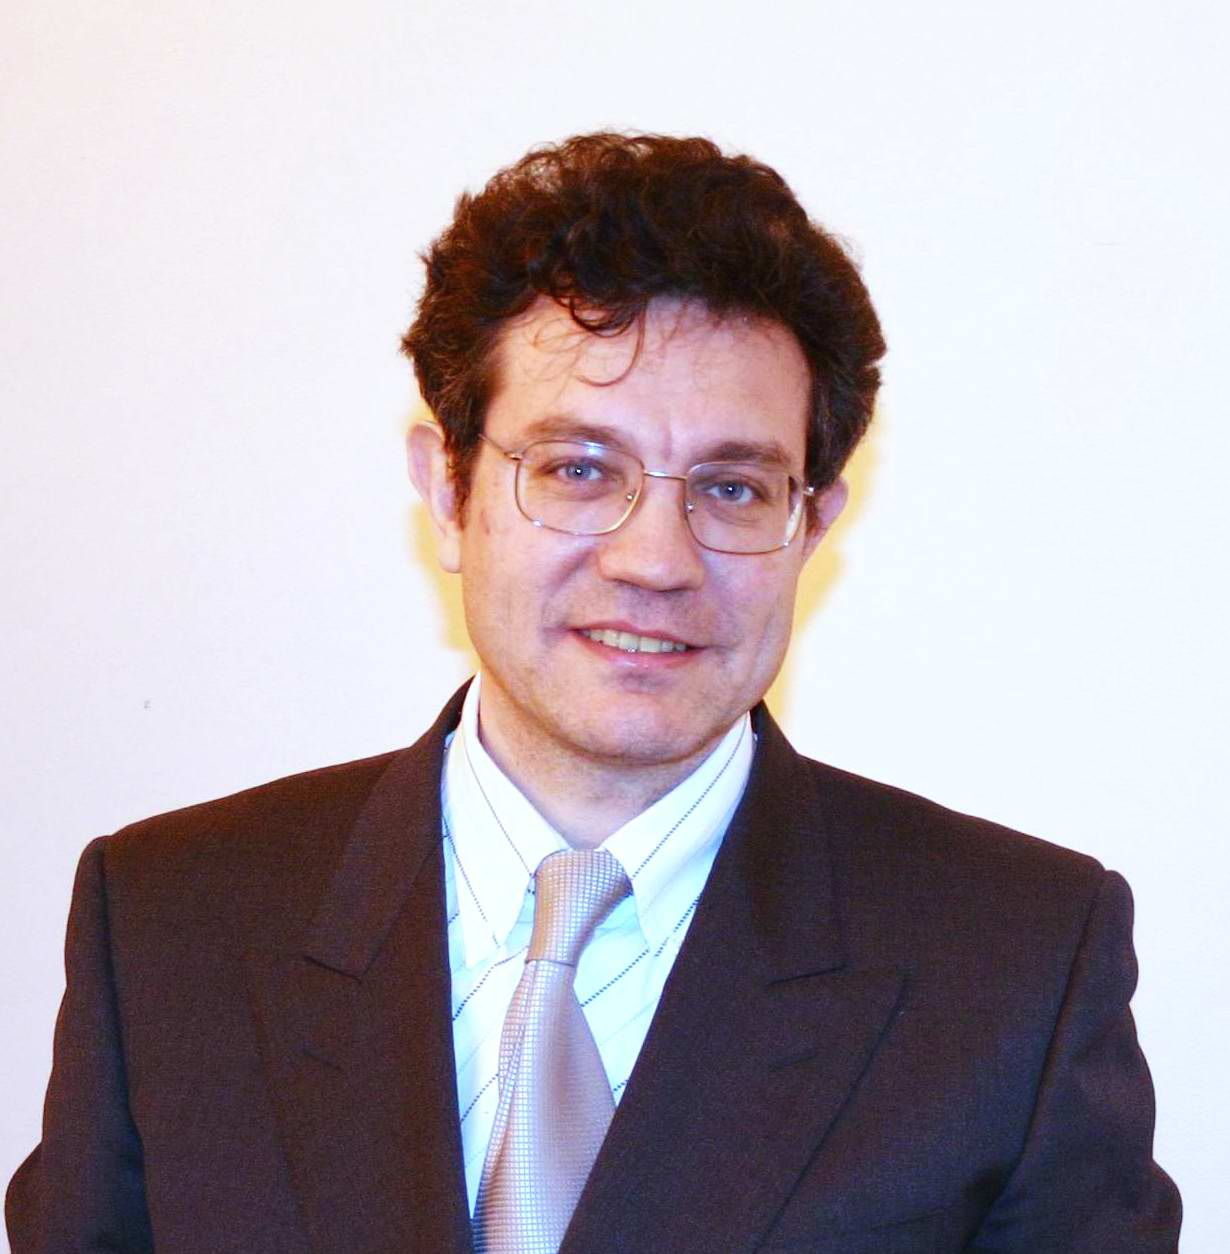 Marco Gozzi